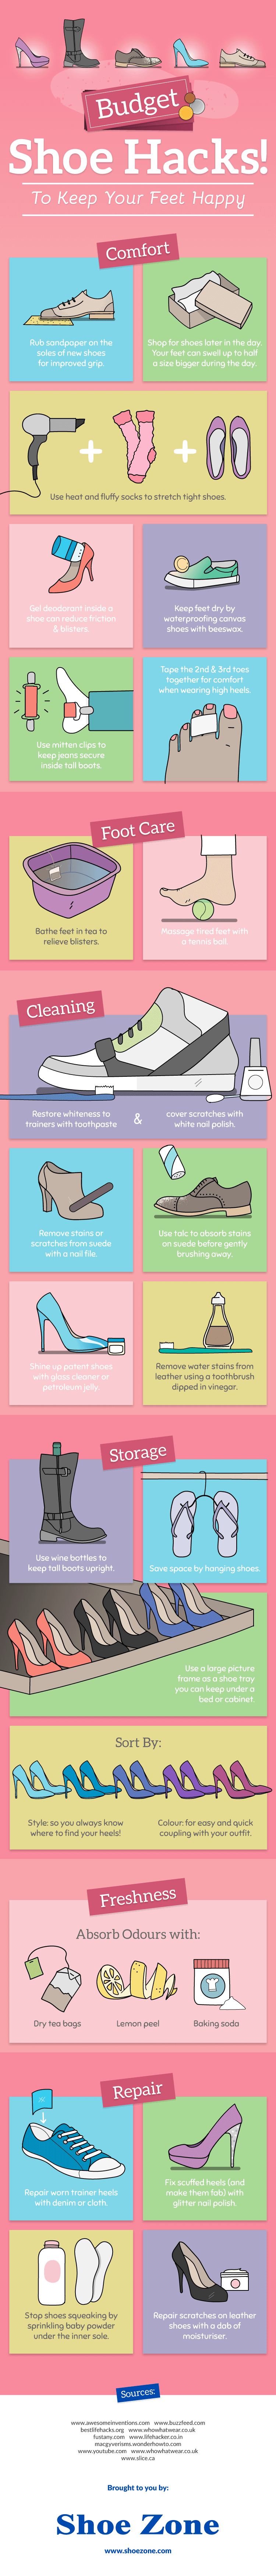 Budget Shoe Hacks